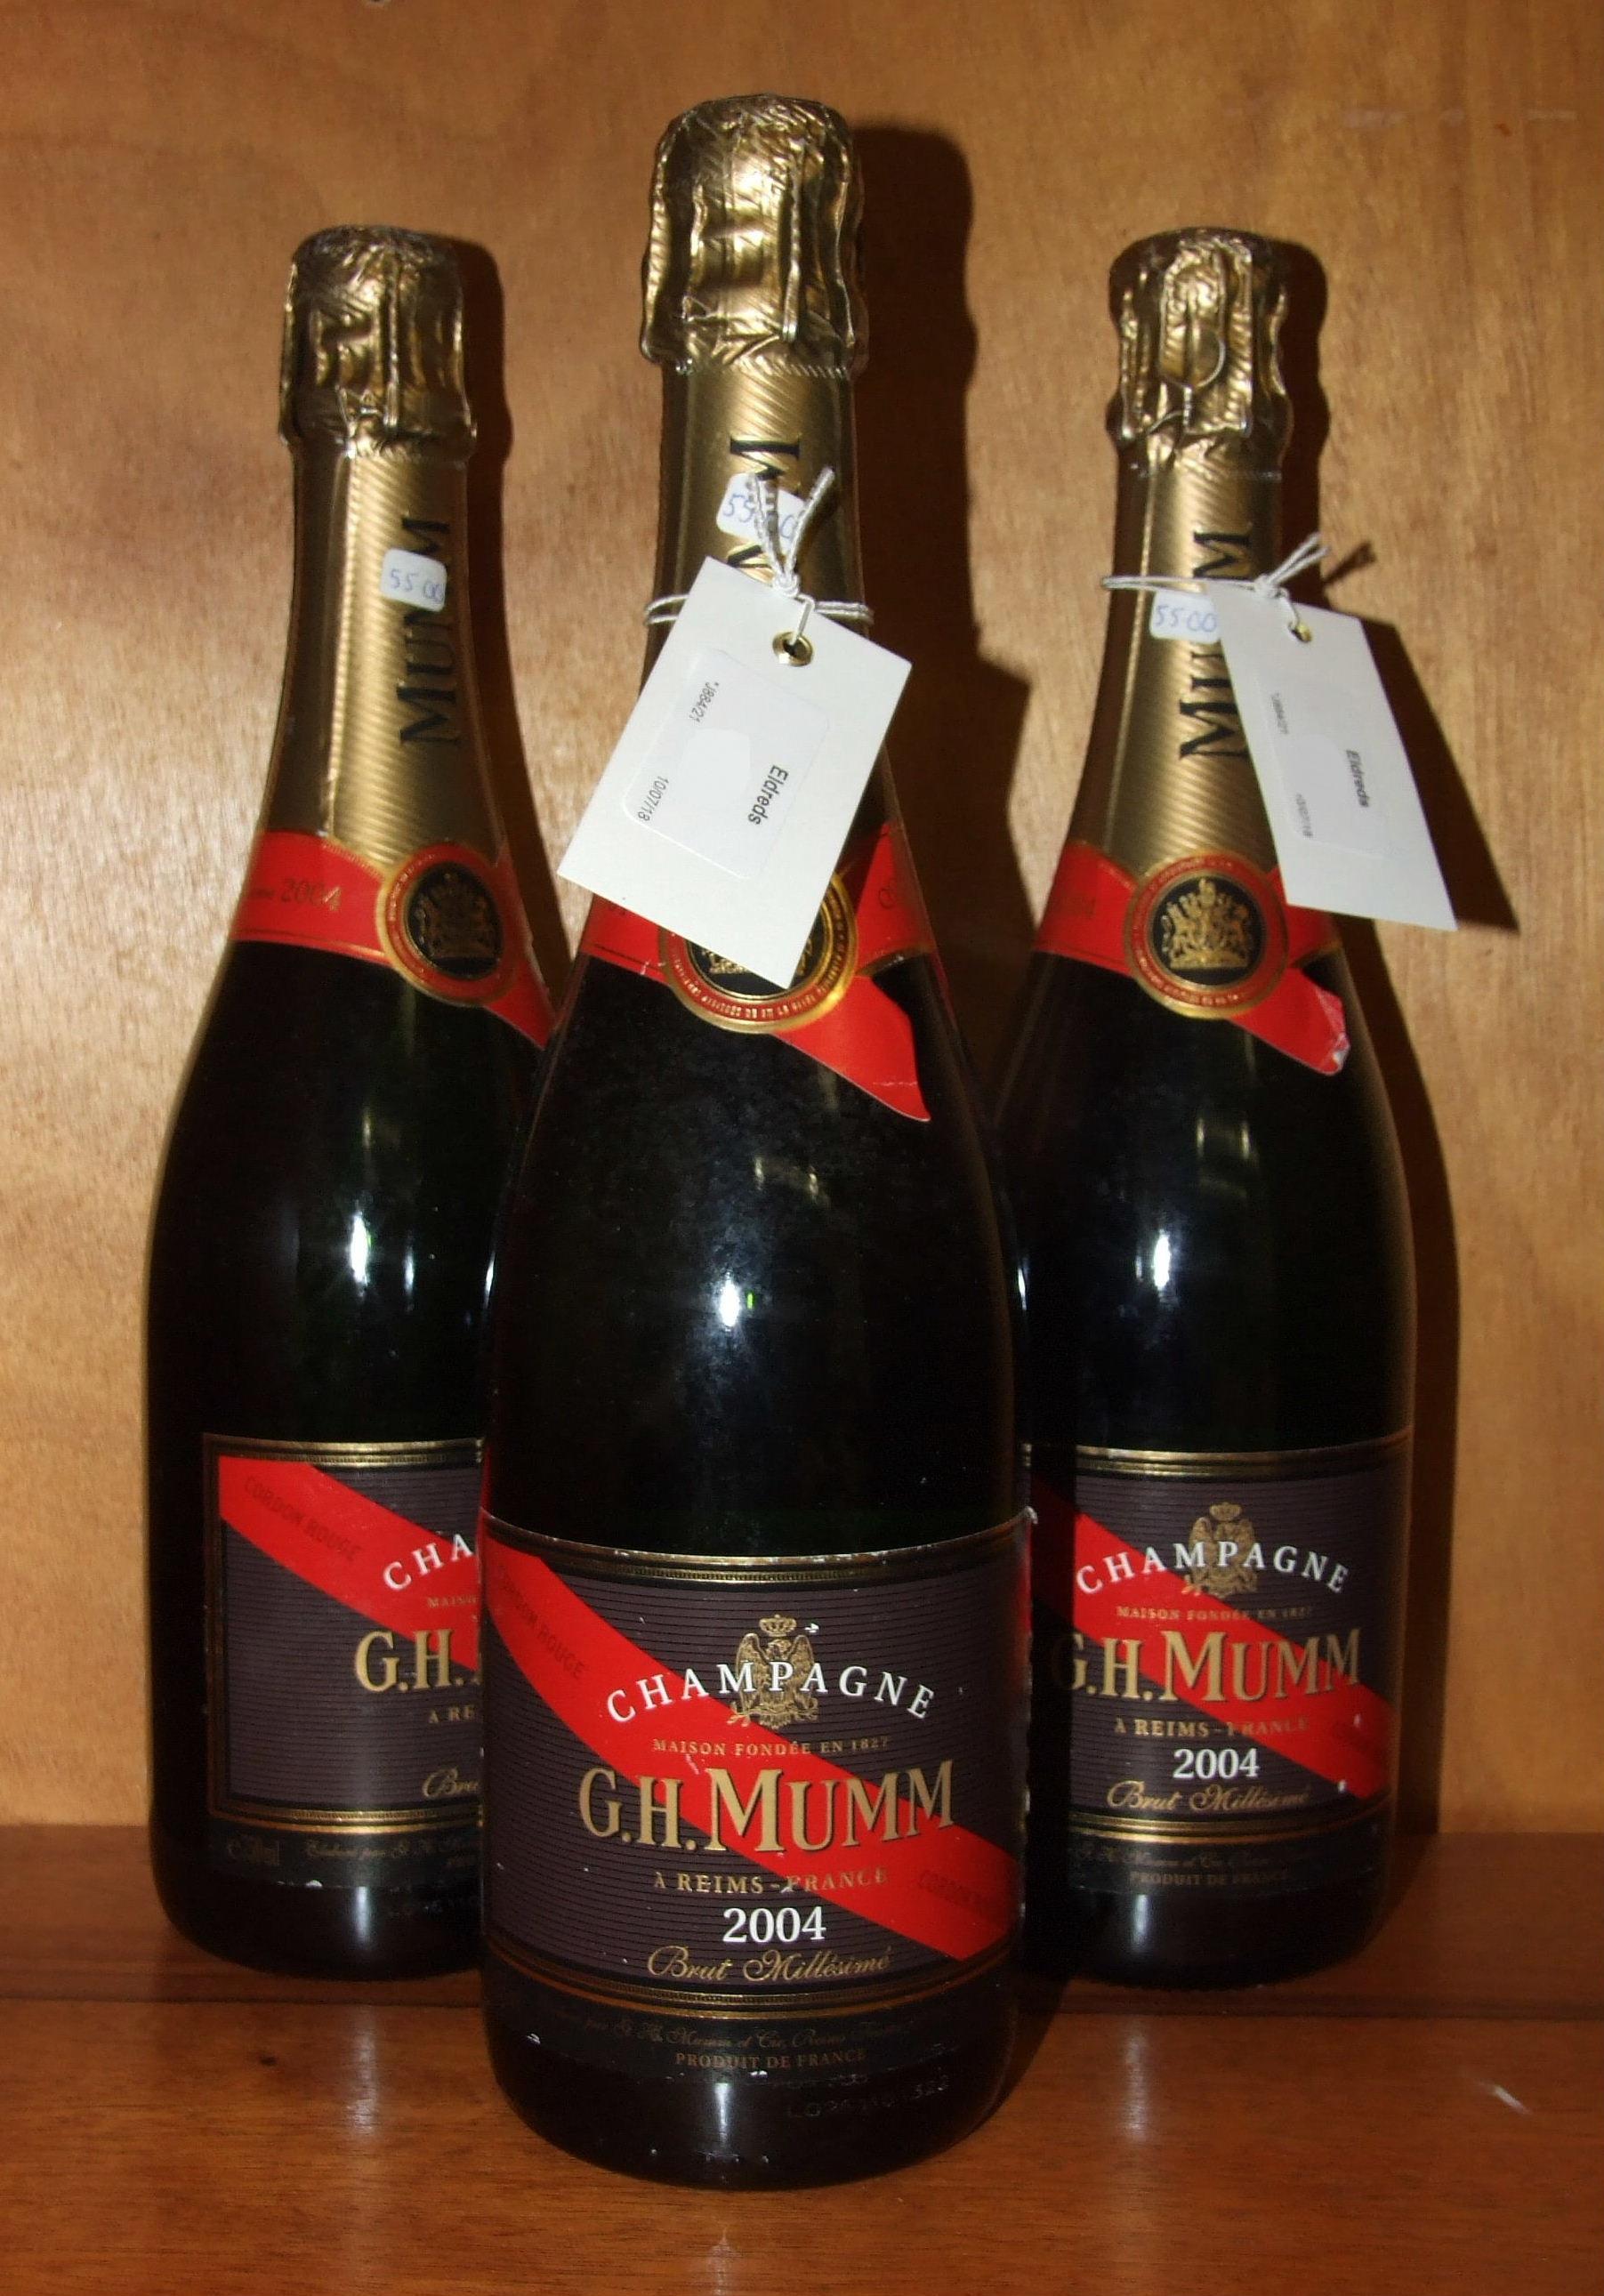 Lot 8 - Mumm, 2004 Vintage, 3 bottles.